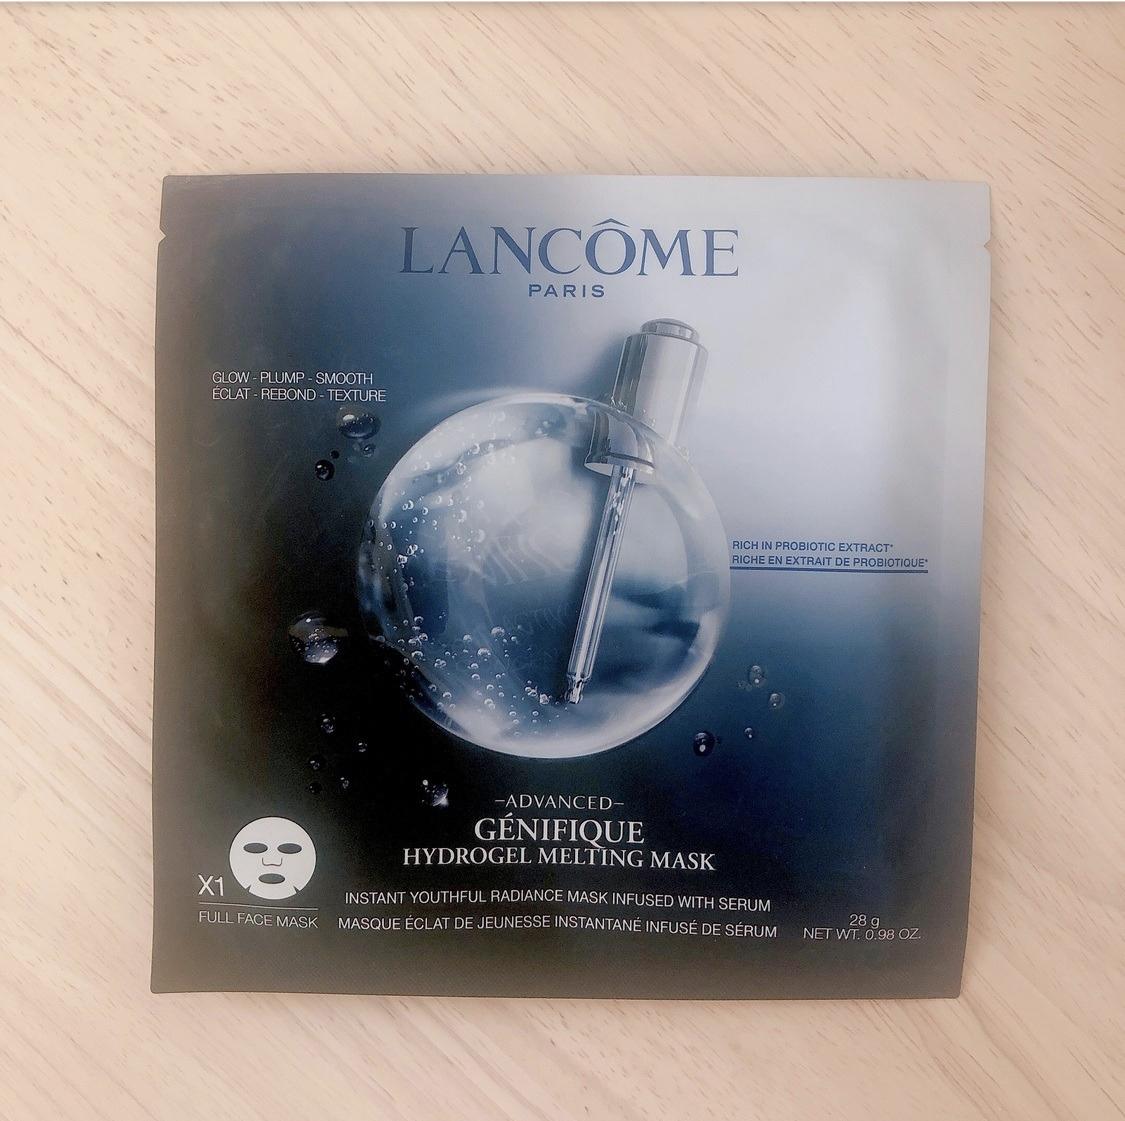 LANCOME(ランコム) ジェニフィック アドバンスト ハイドロジェル メルティングマスクの良い点・メリットに関するみーさん¨̮⸝⋆さんの口コミ画像1